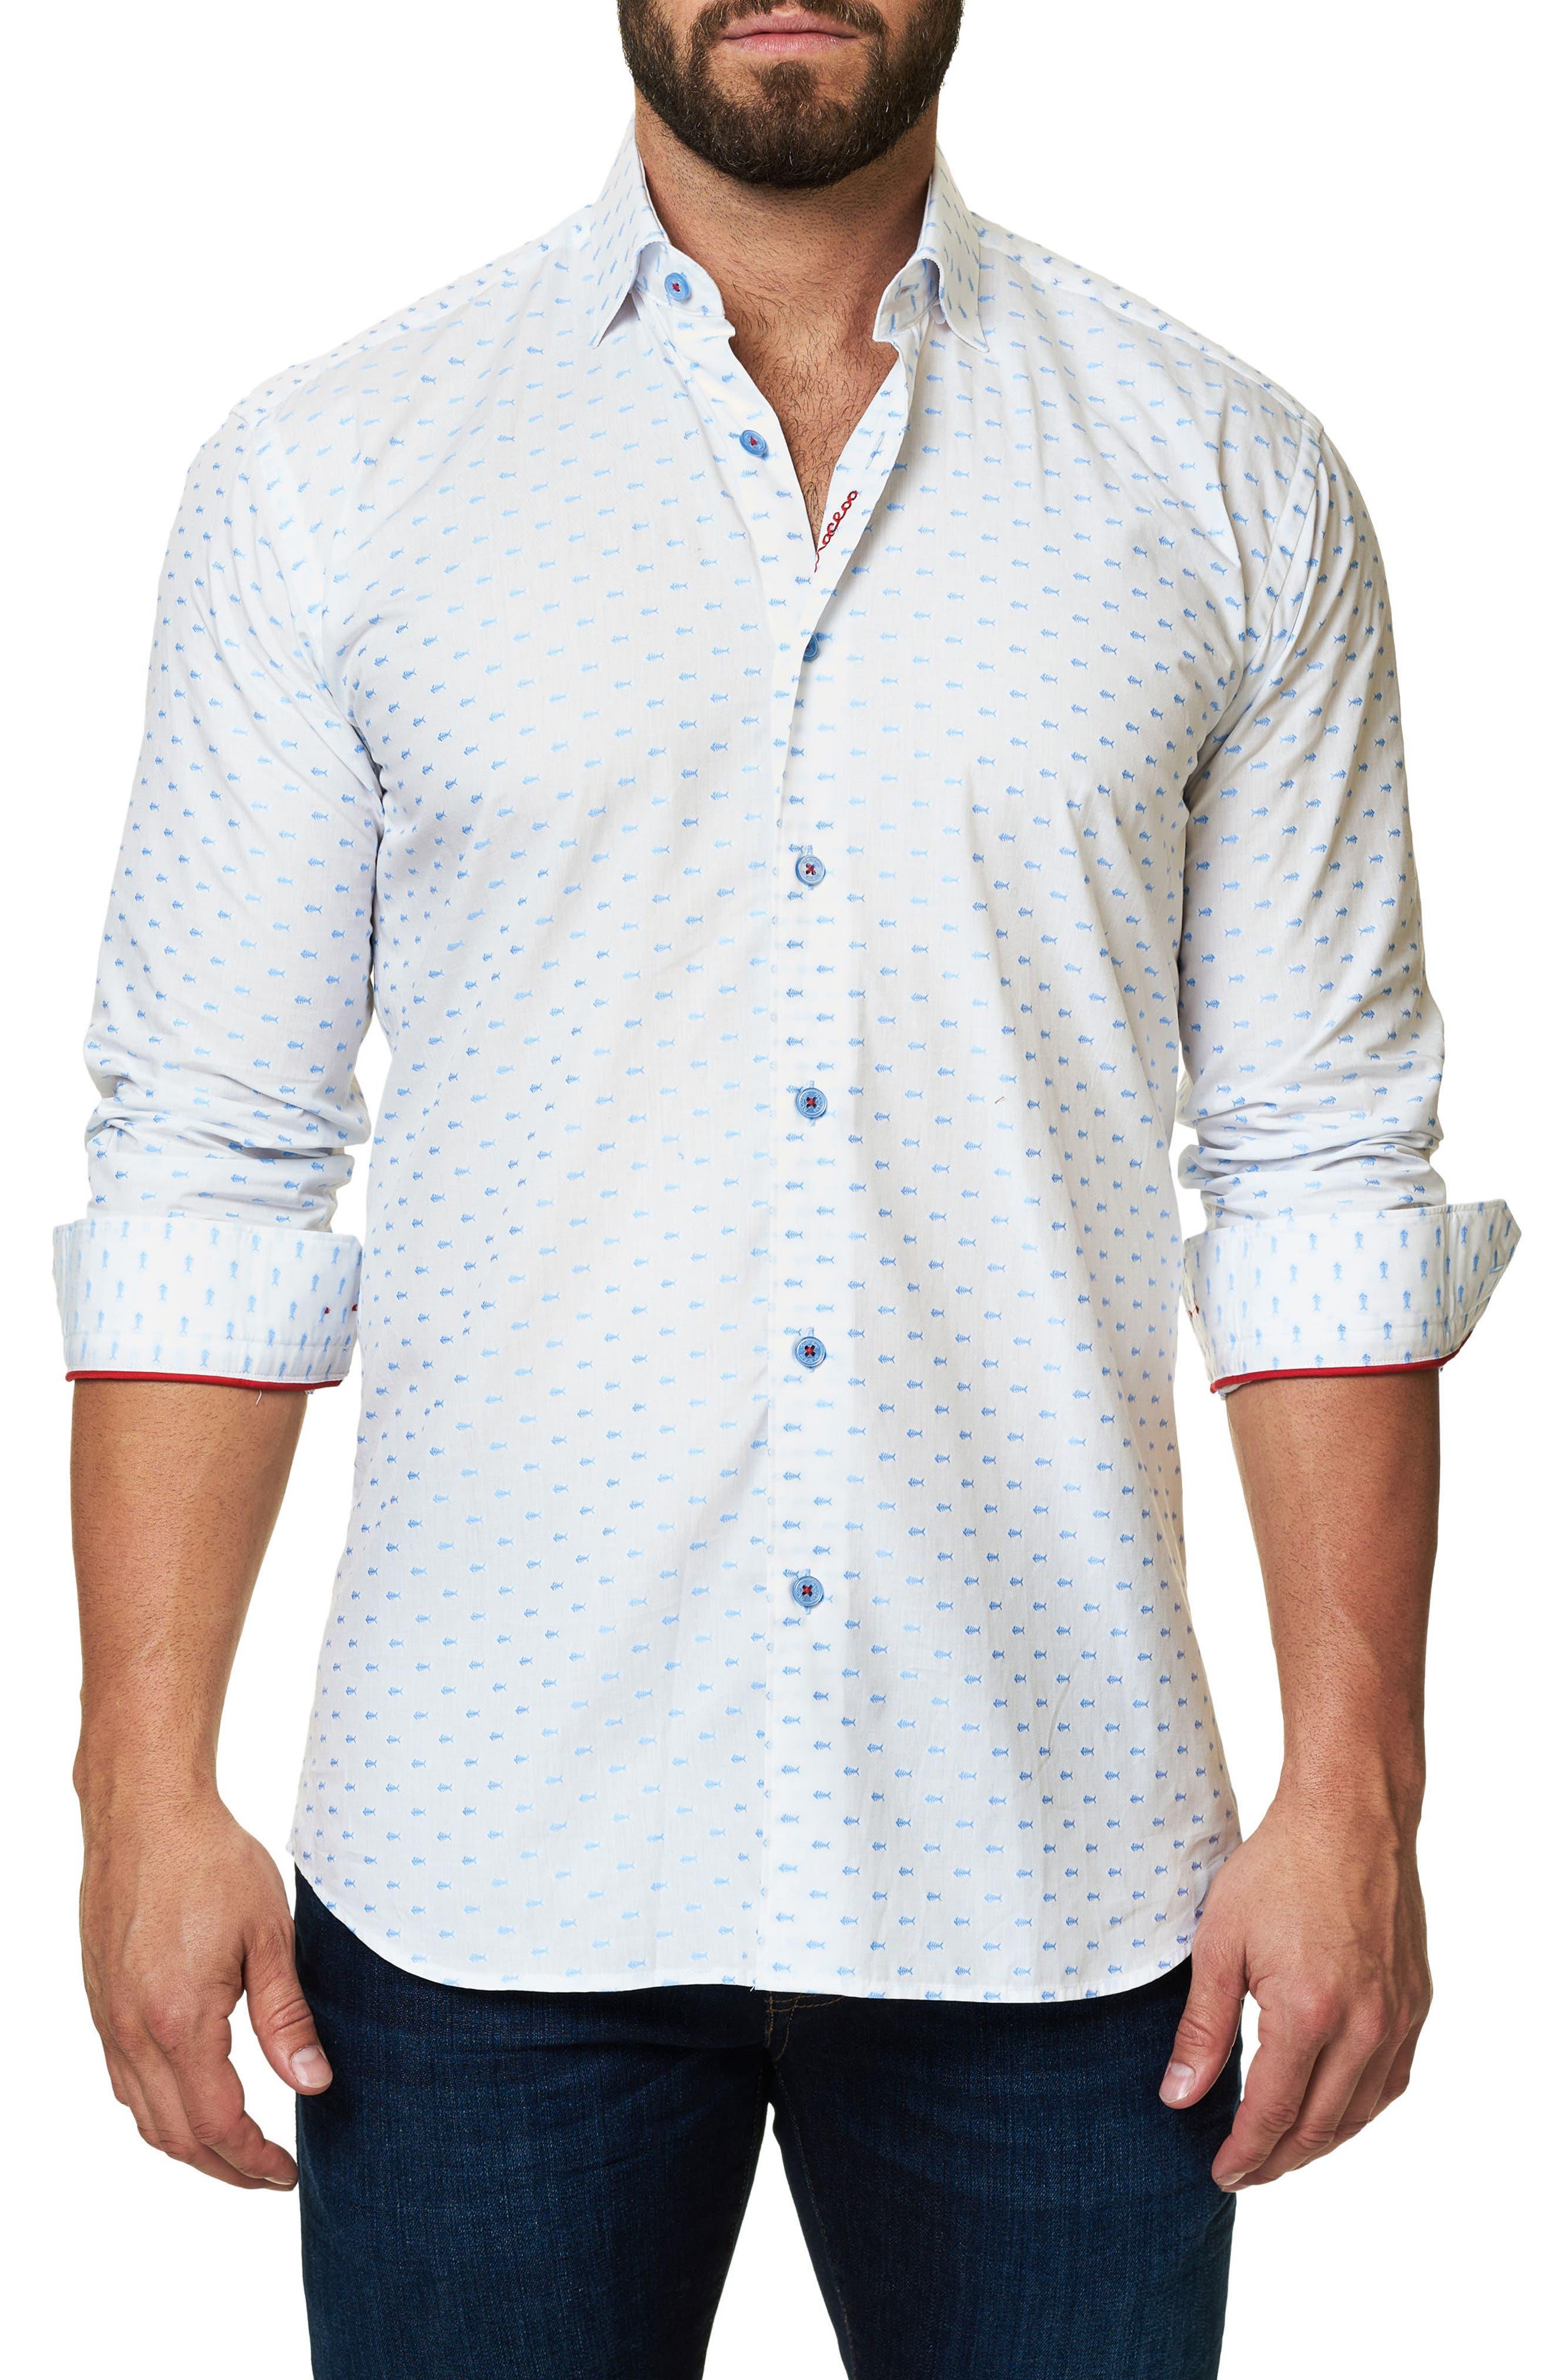 Main Image - Maceoo Trim Fit Fish Print Sport Shirt